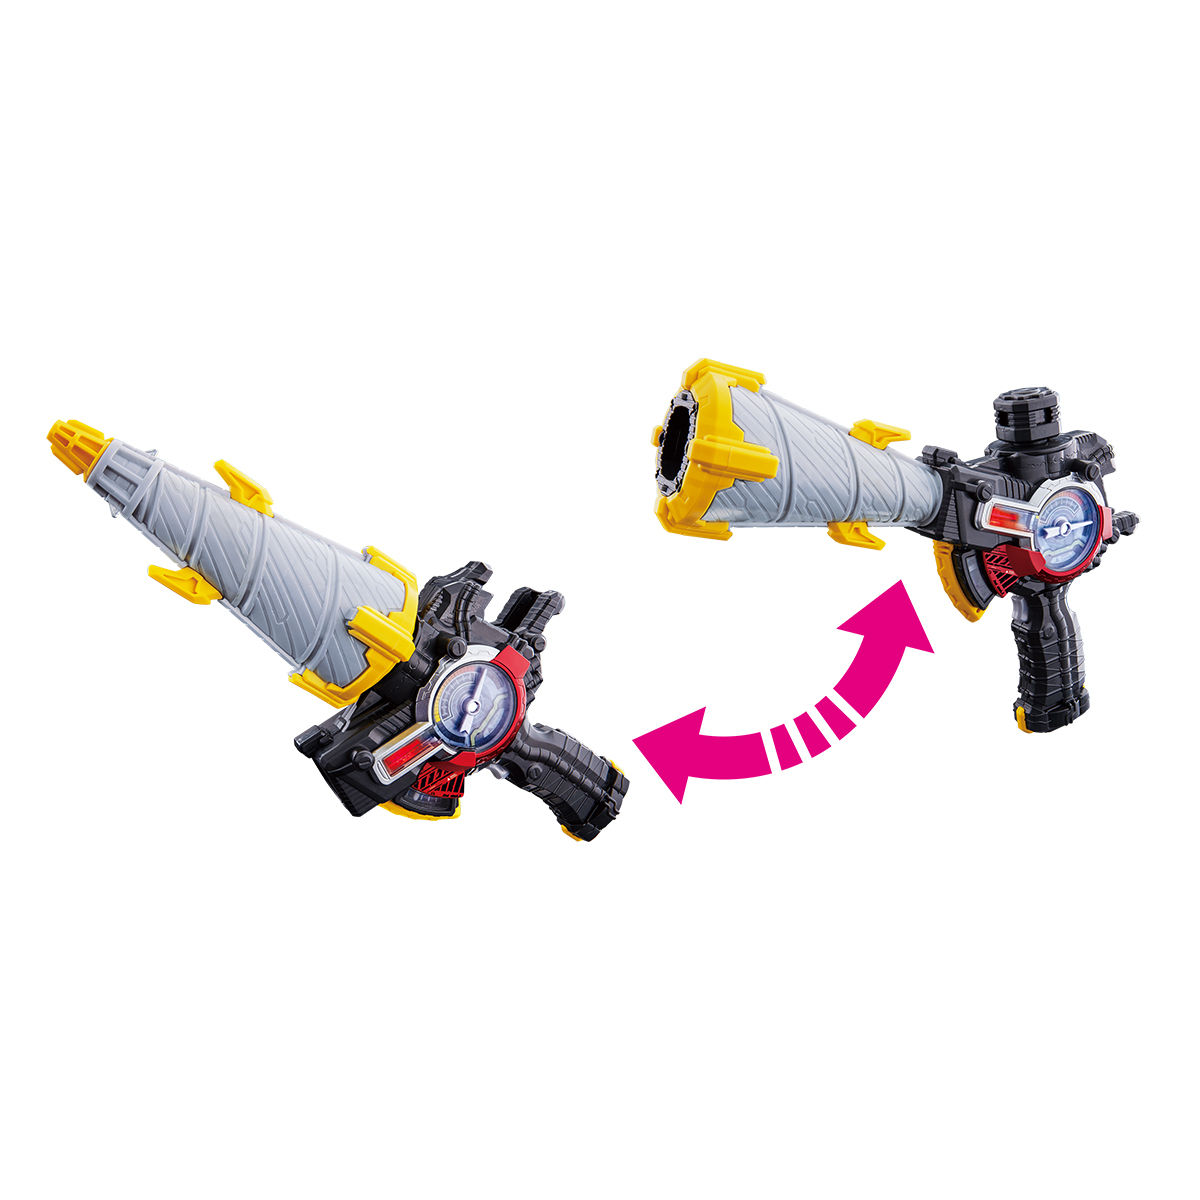 Image 4 - Kamens ライダー構築ドリル Smasher DX 武器リンクすることがフルボトルアクション図クリスマスギフト子供のためのアクション & トイ フィギュア   -